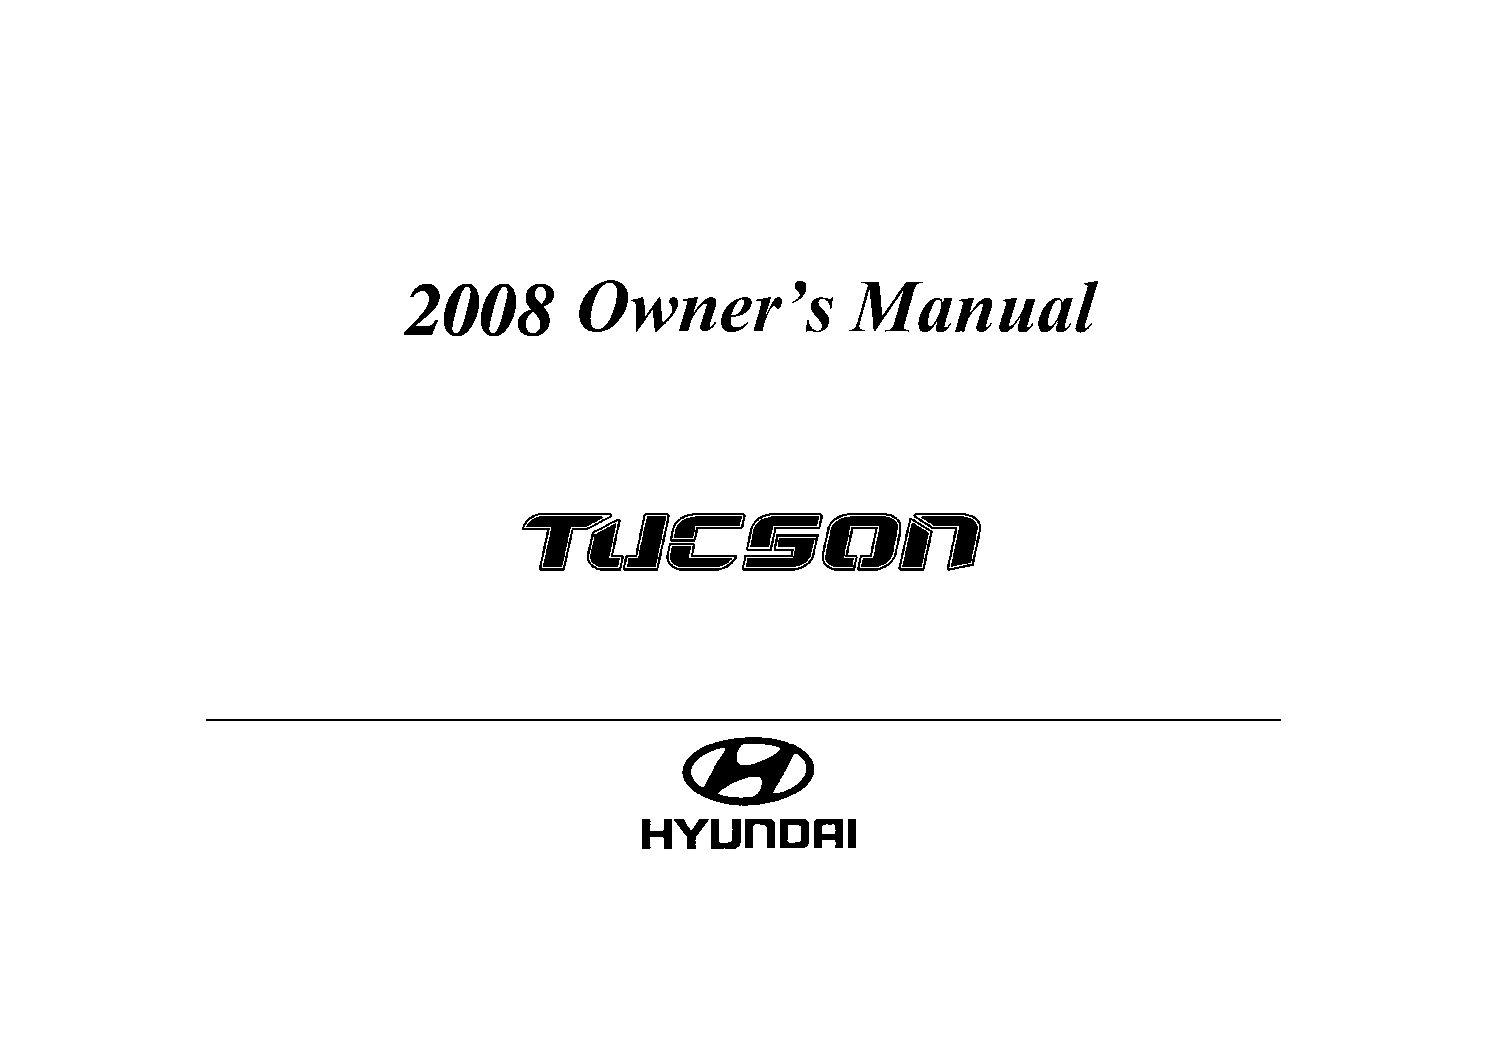 2008 hyundai tucson owners manual just give me the damn manual rh justgivemethedamnmanual com 2006 hyundai tucson owners manual pdf 2006 hyundai tucson owners manual pdf